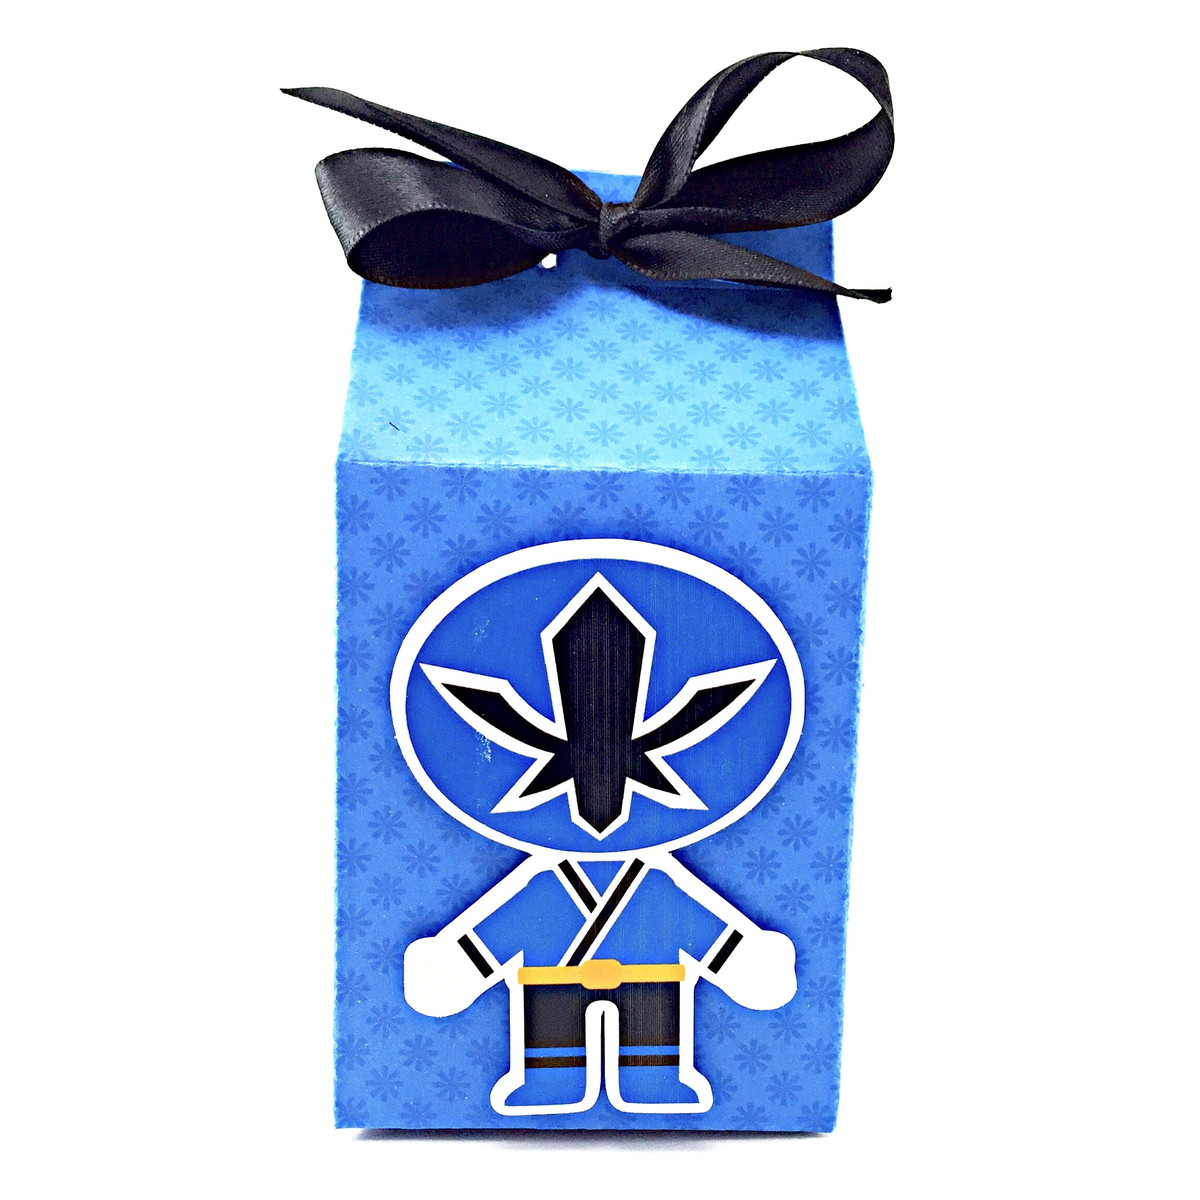 Caixinha Milk - Power Rangers  - Marina Levy Festas